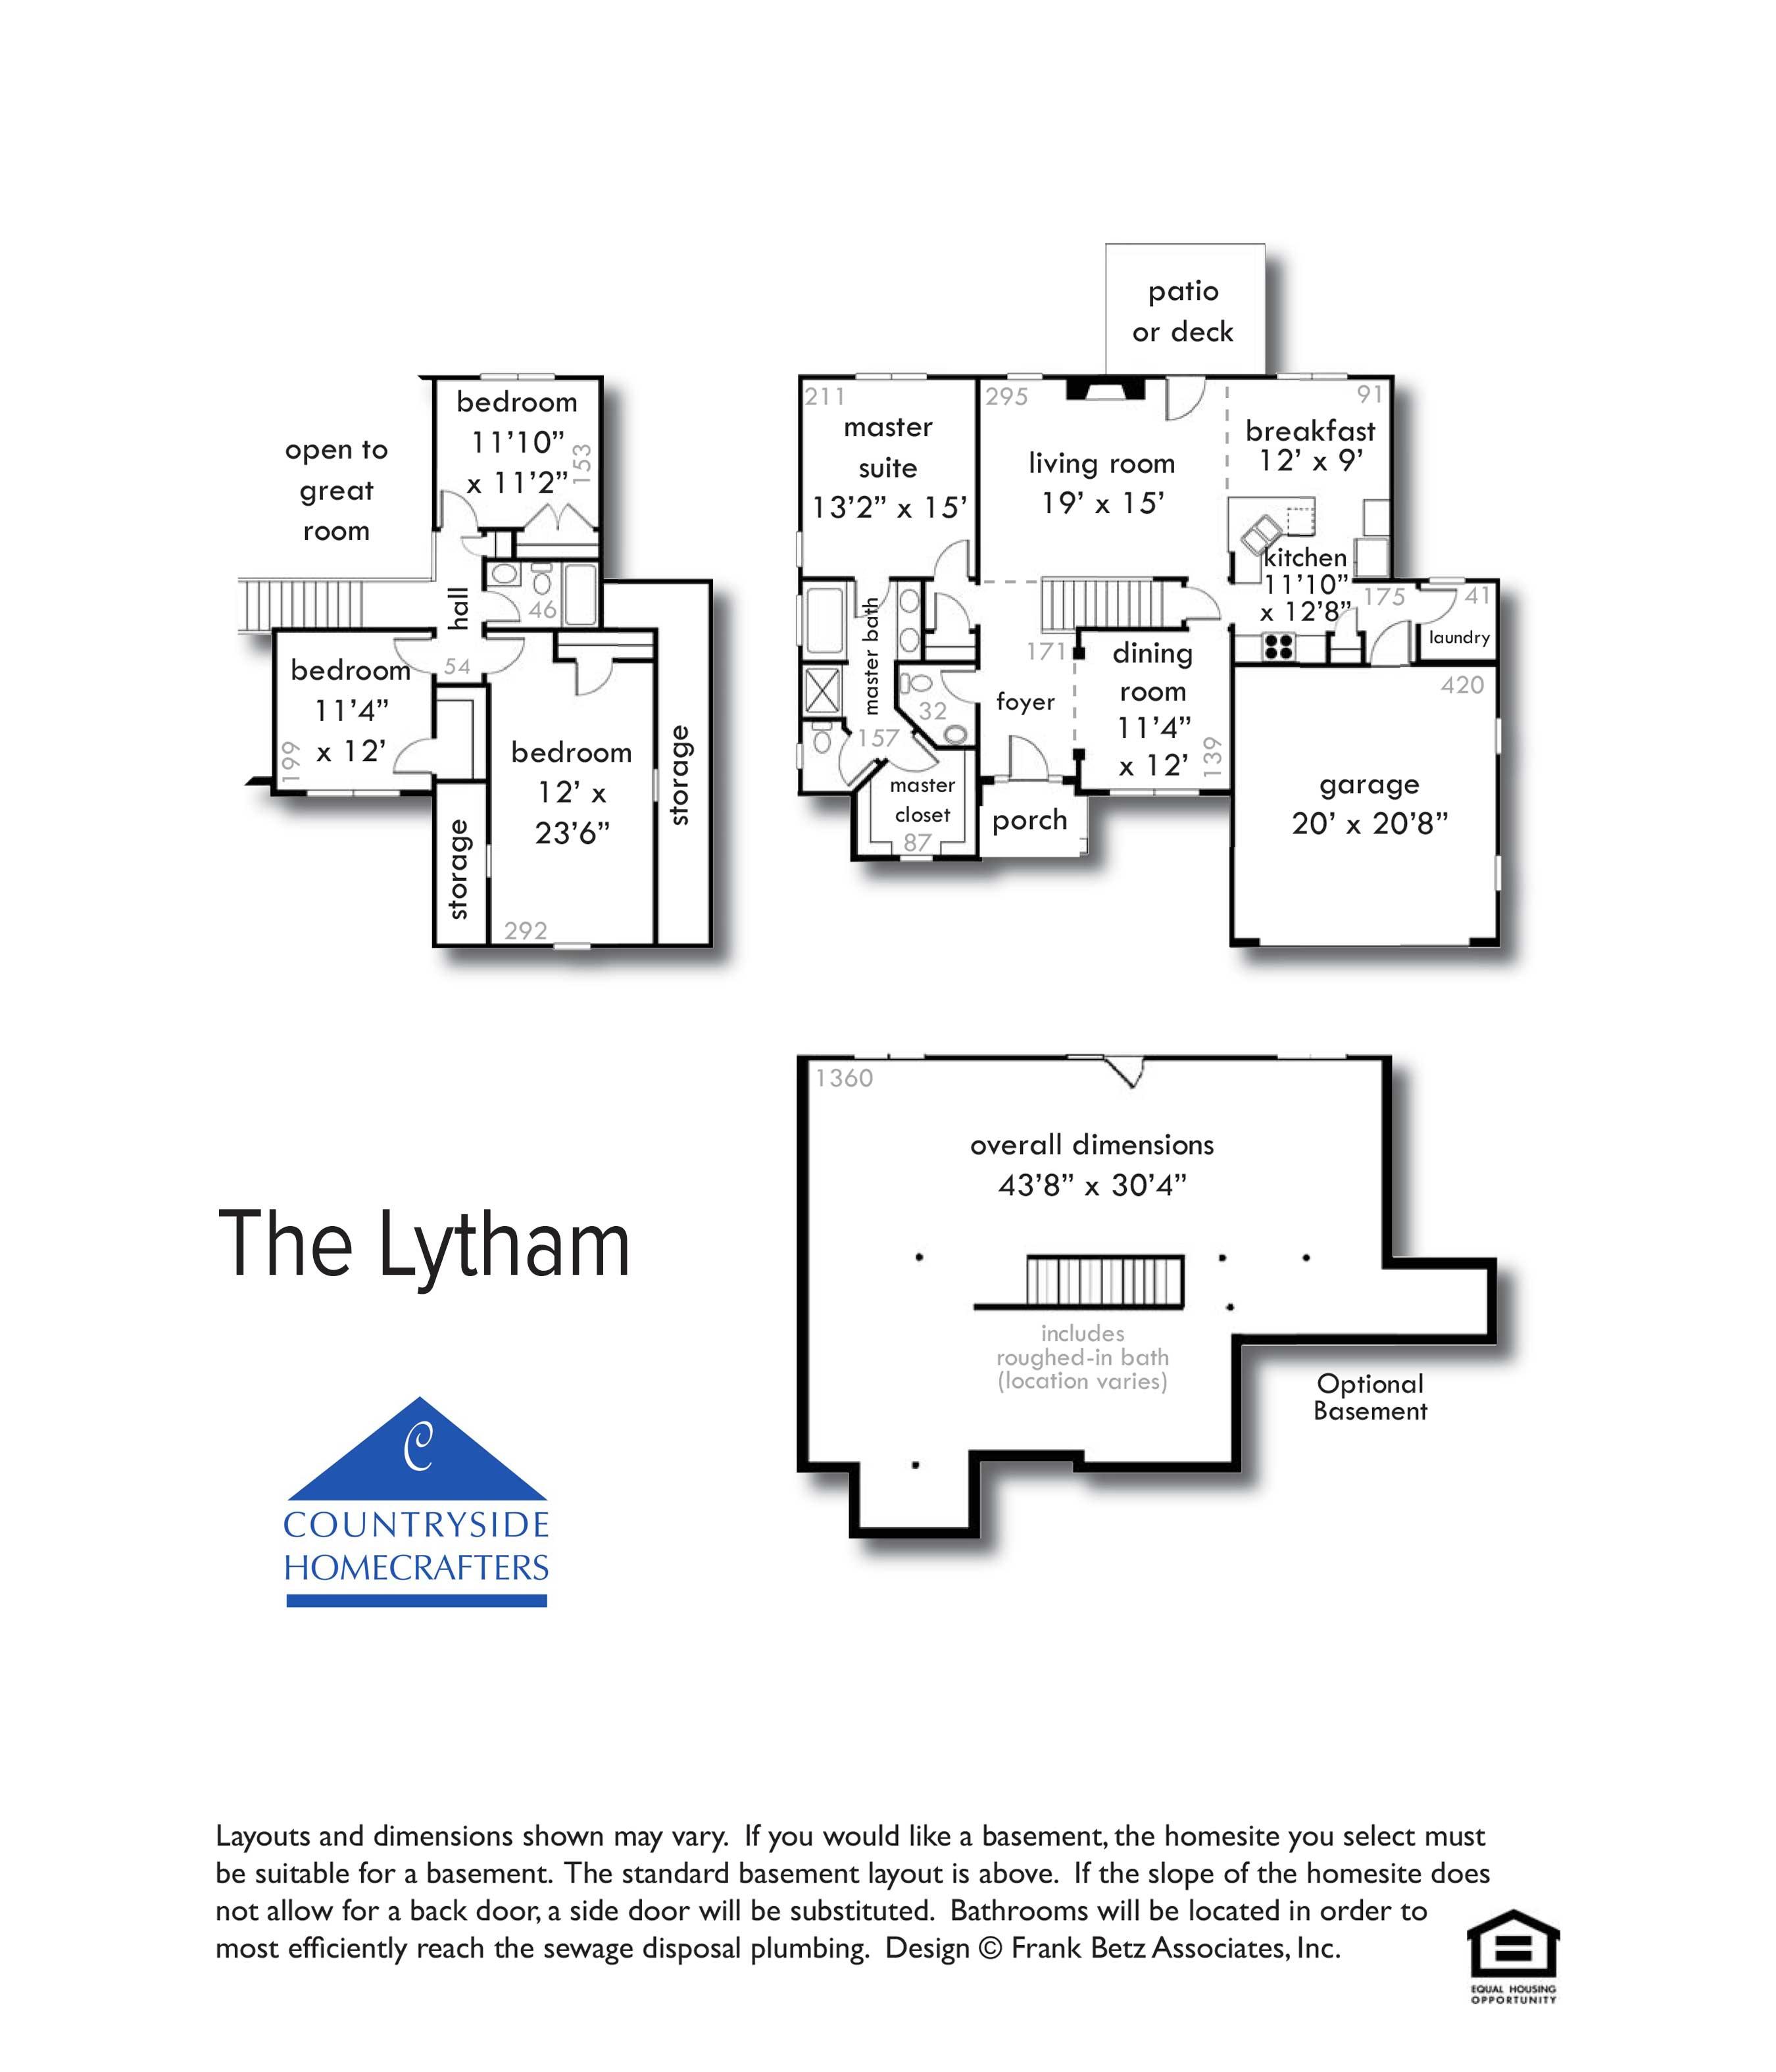 The Lytham